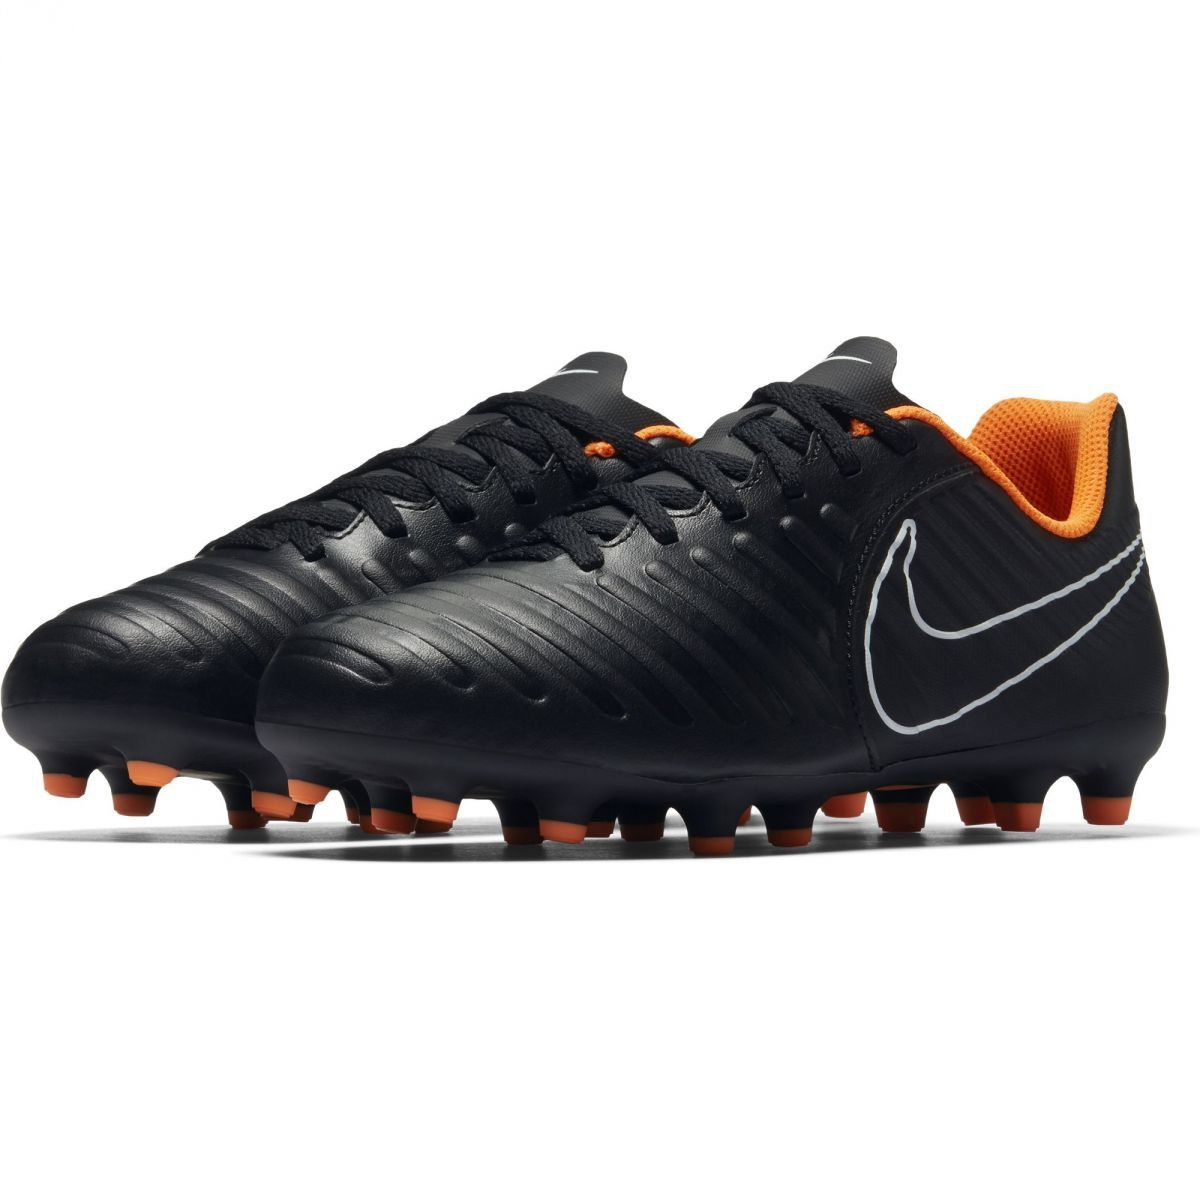 Corks Football Sport Nike Nike Tiempo Legend 7 Club Fg Jr Football Boots Black Black Football Boots Black Boots Football Shoes